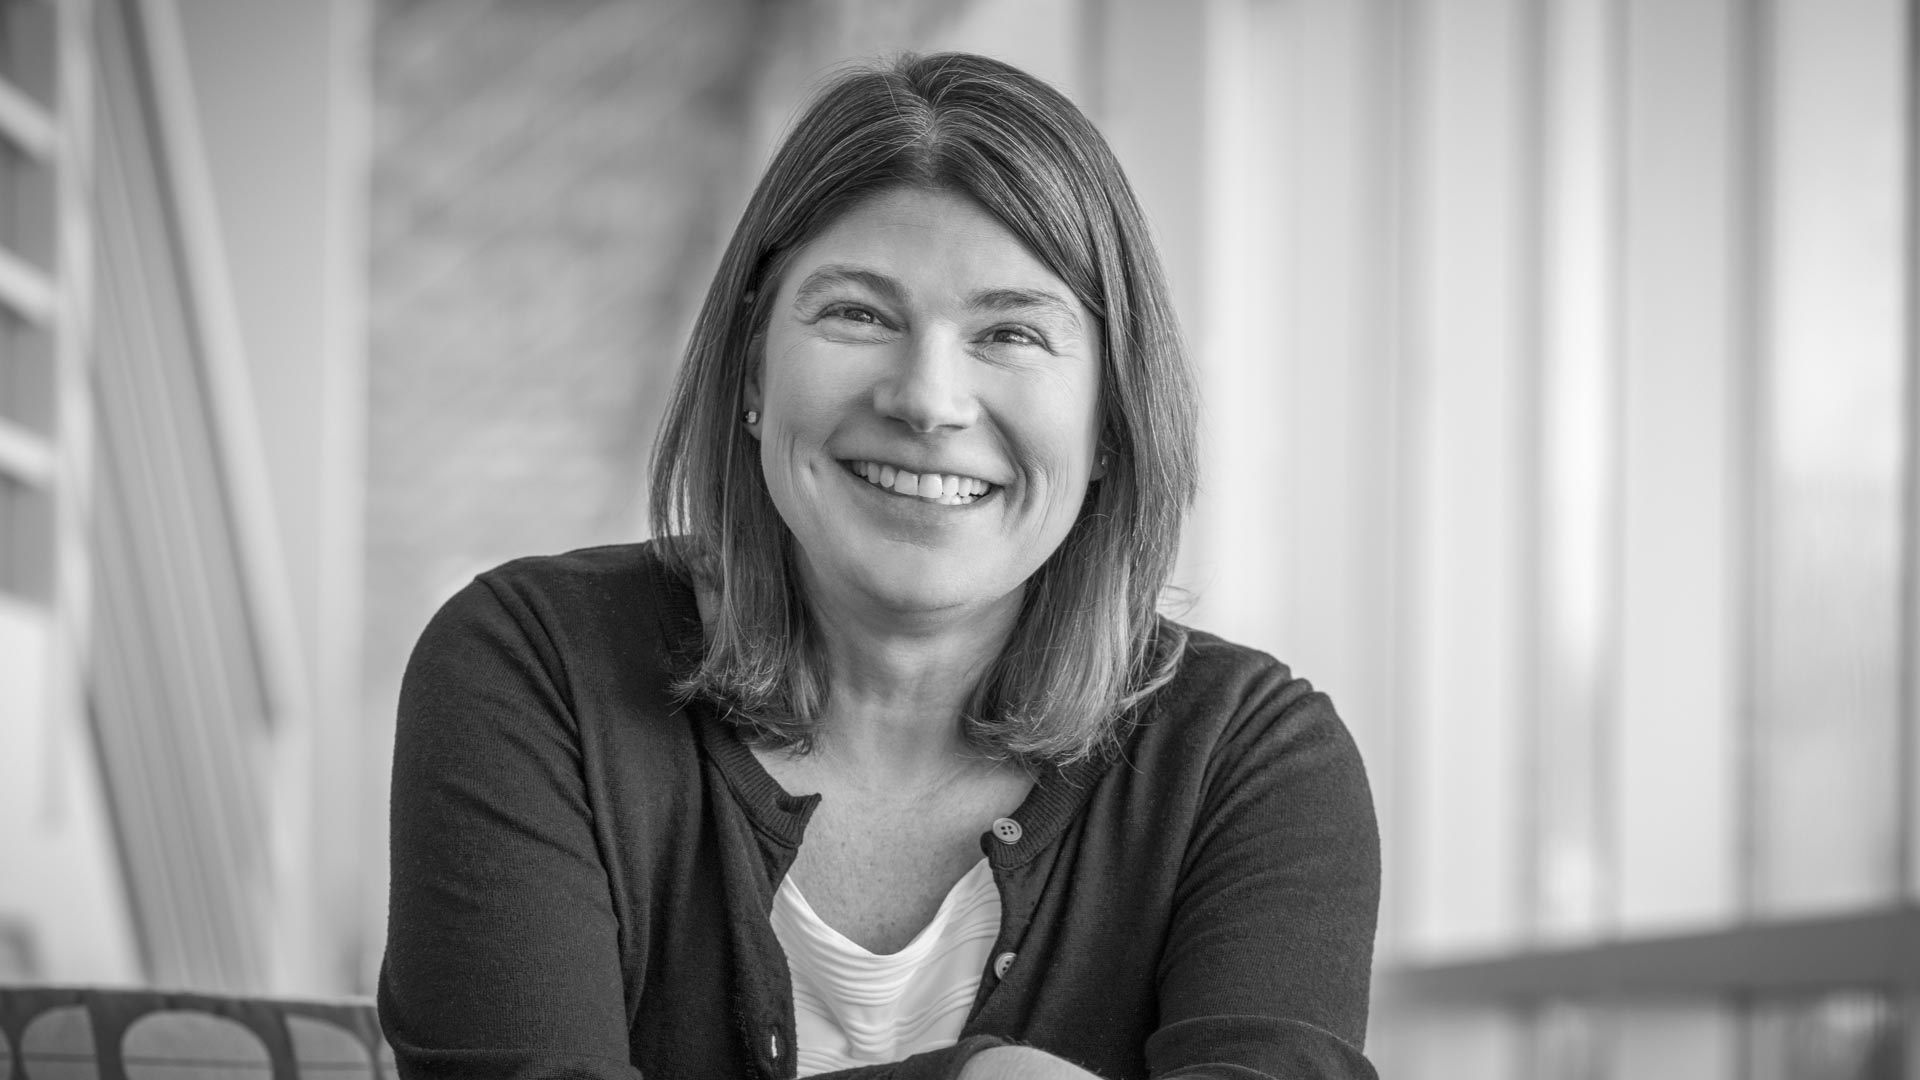 Laura Serebin, AIA, LEED AP